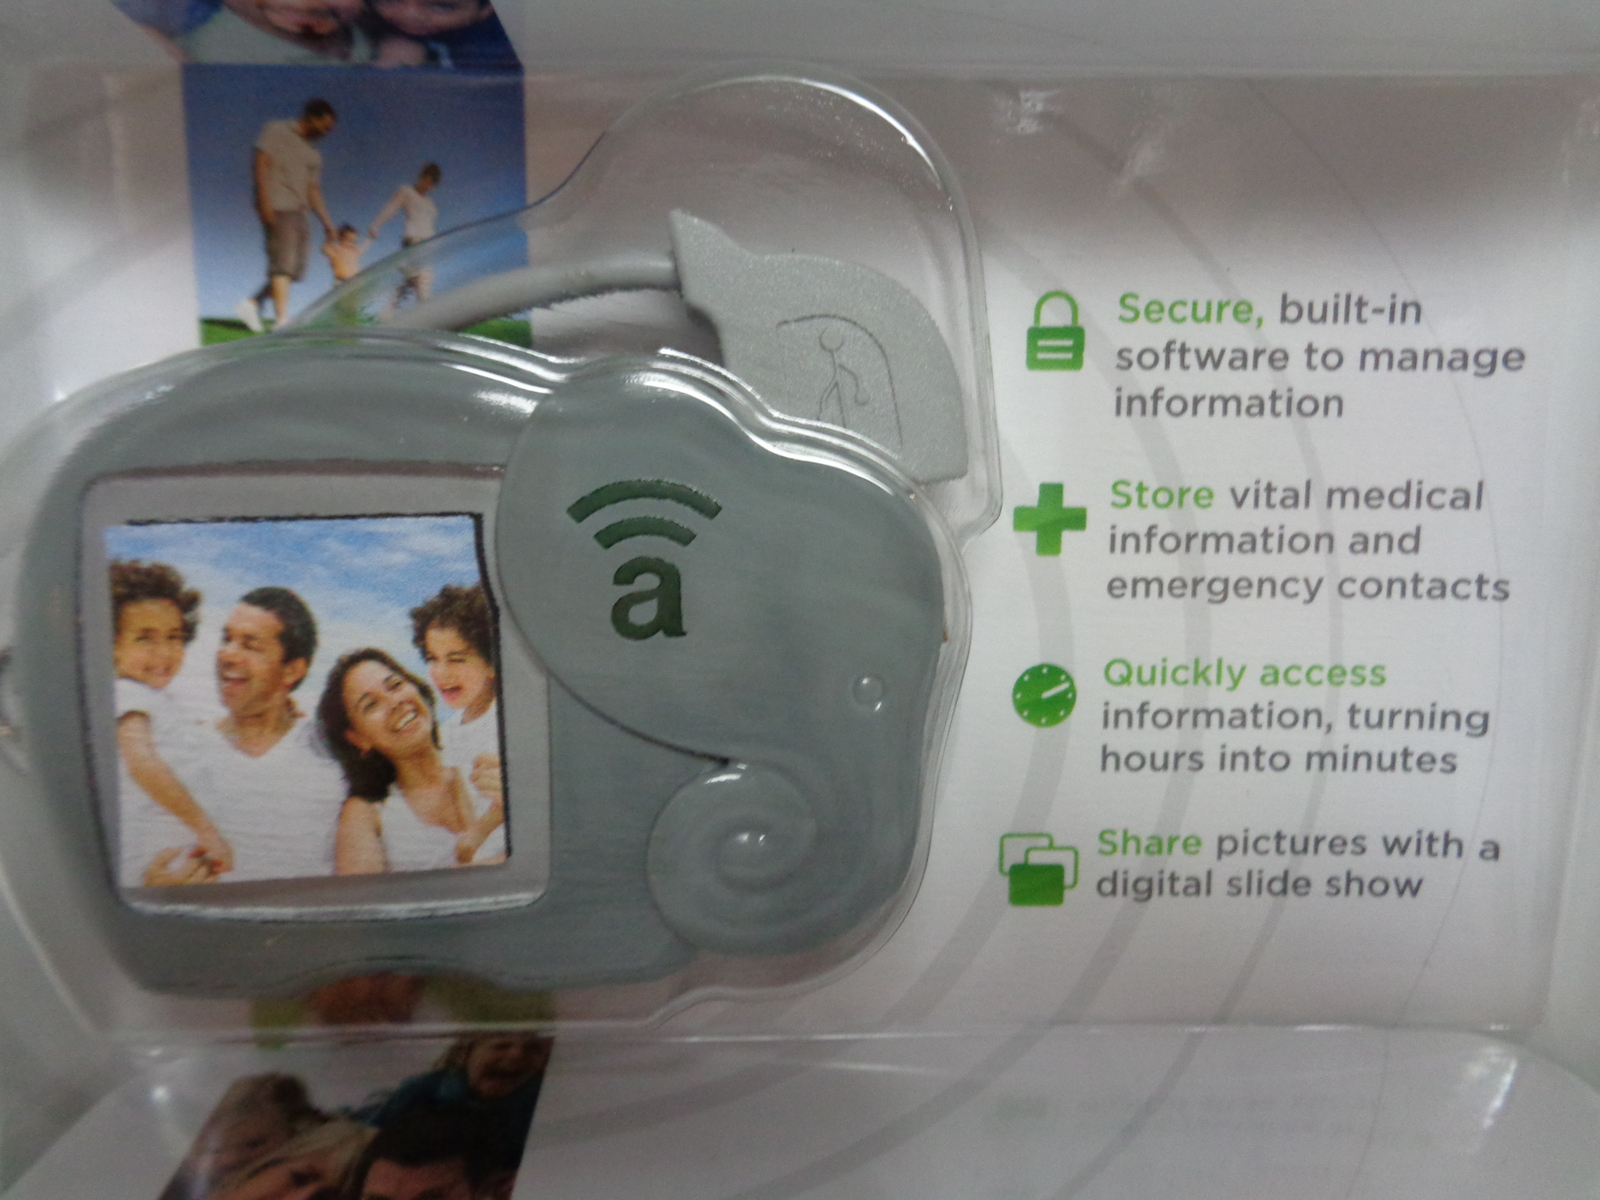 New Amber Alert My Child ID Safeguard Child Vital Information Gray Elephant USB